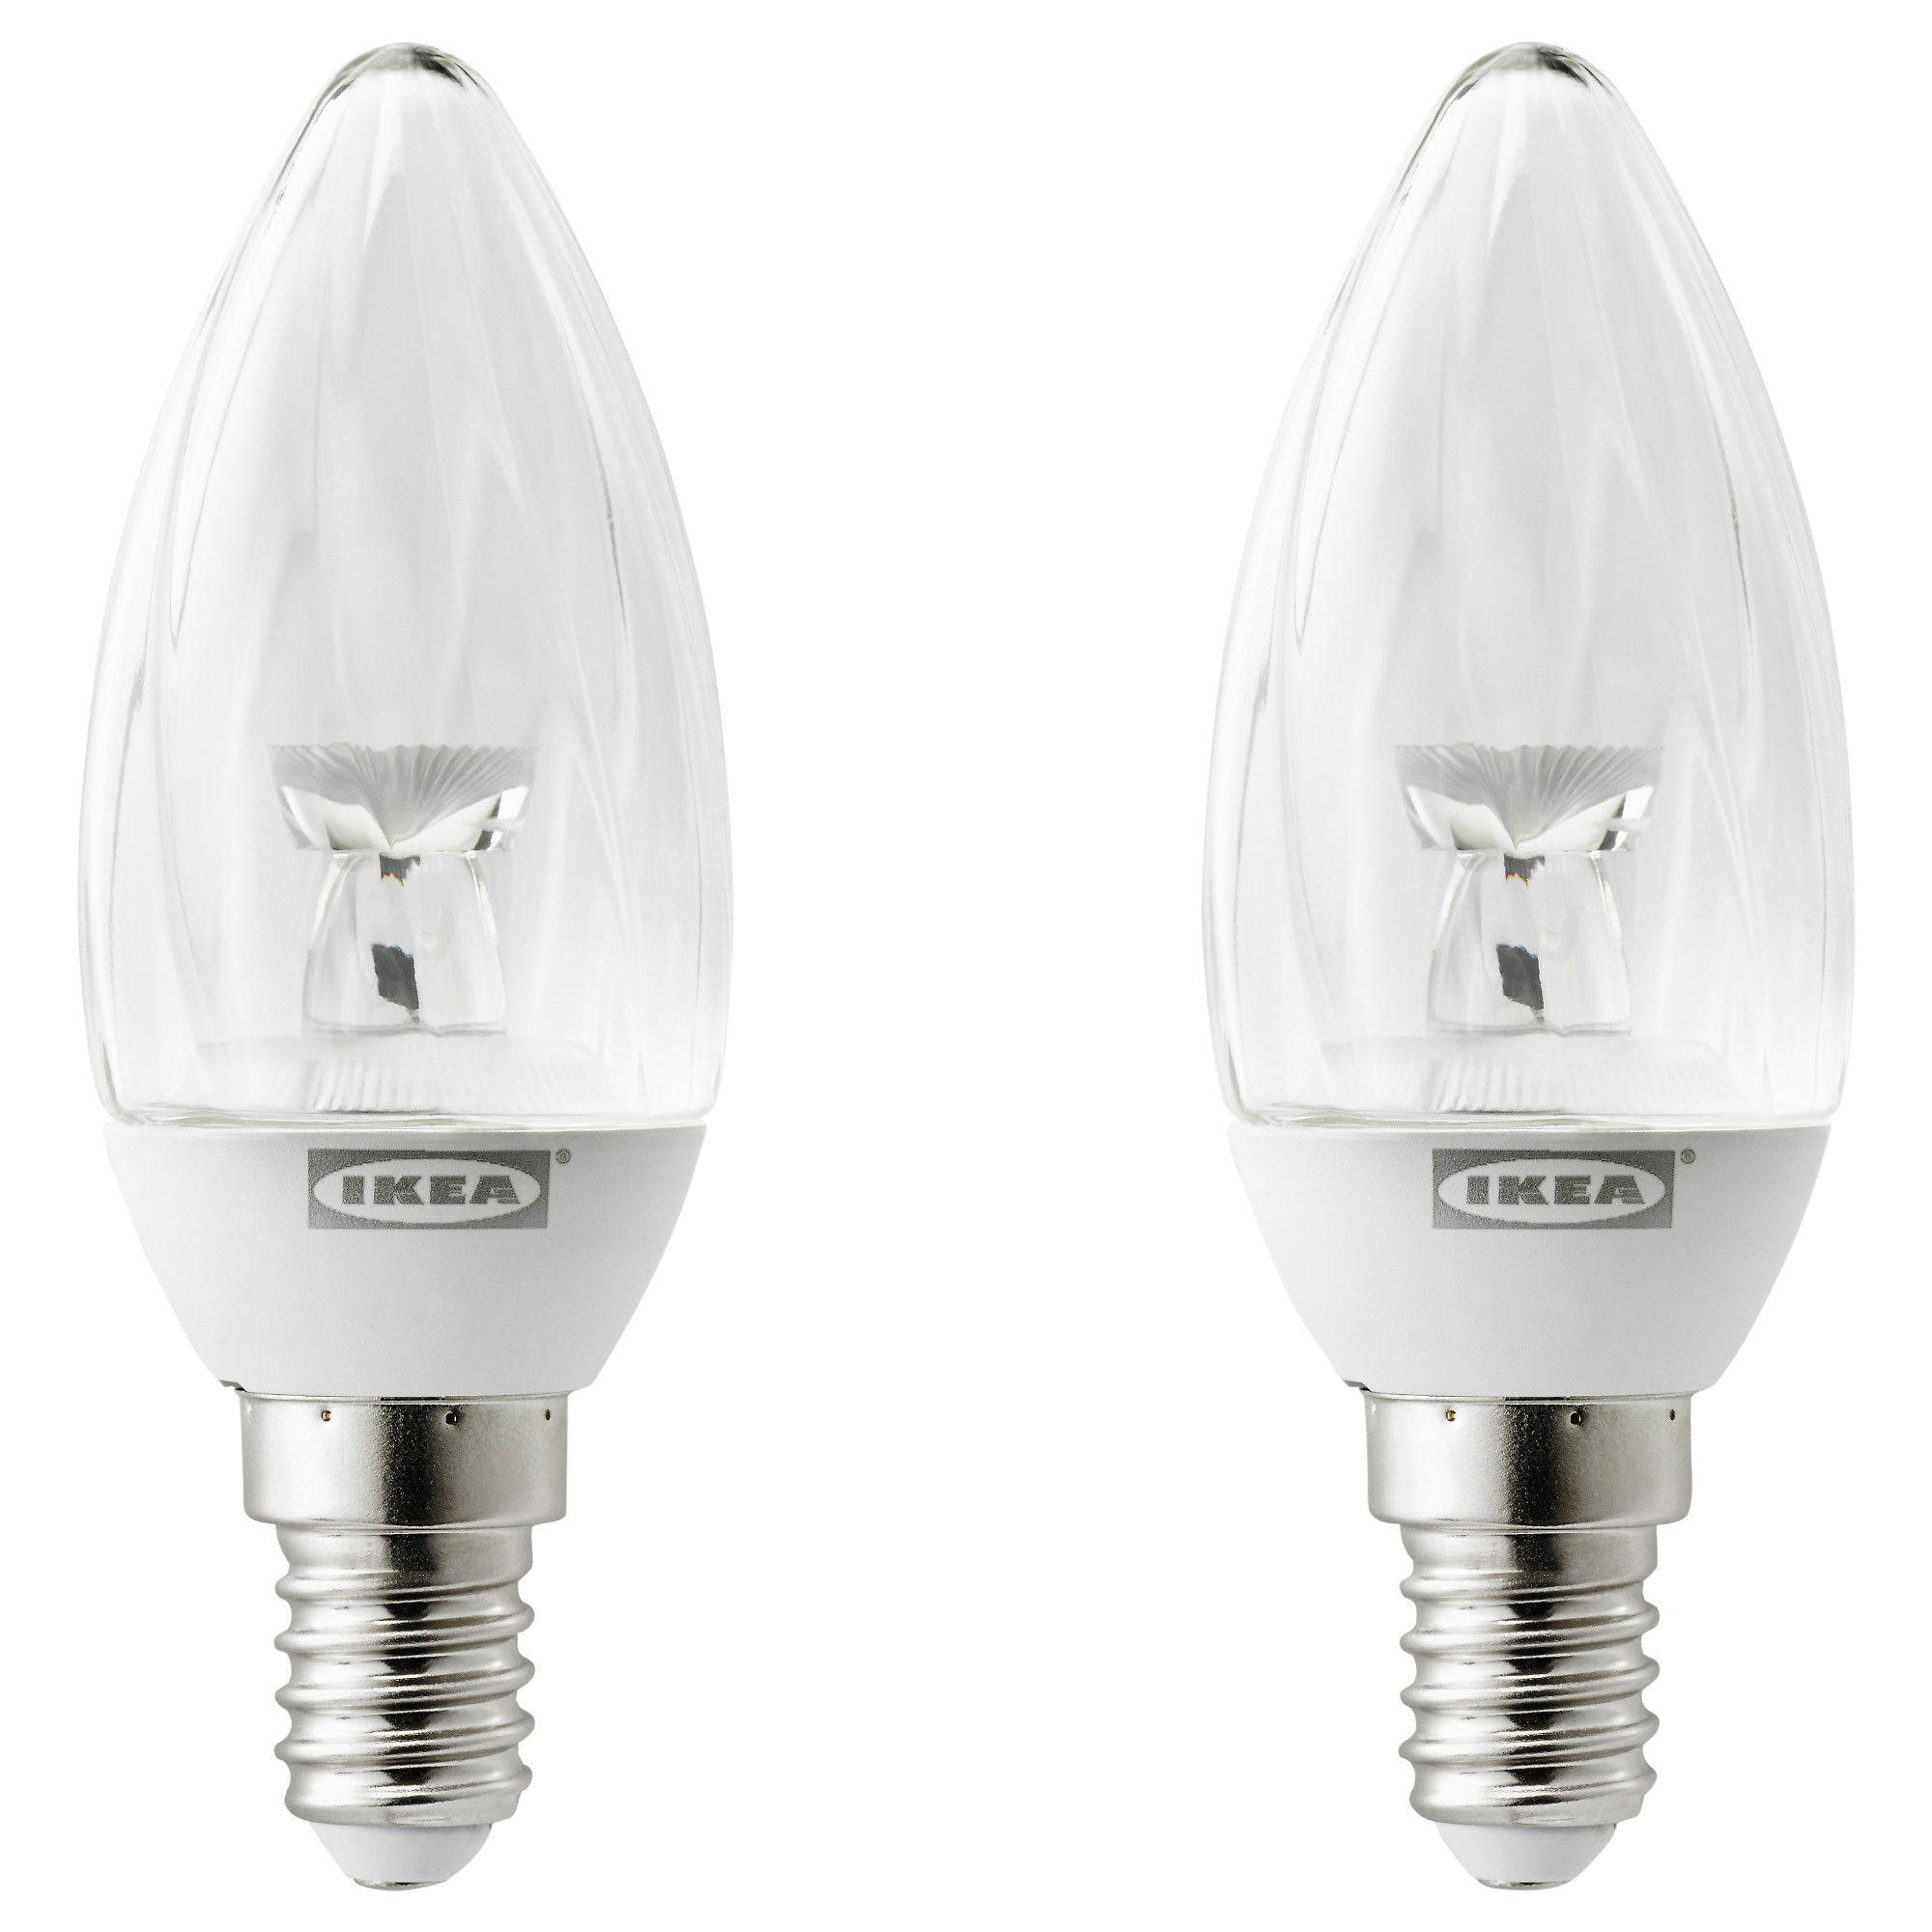 RYET LED Bulbs, IKEA #70343453 | Lighting Products | Ikea